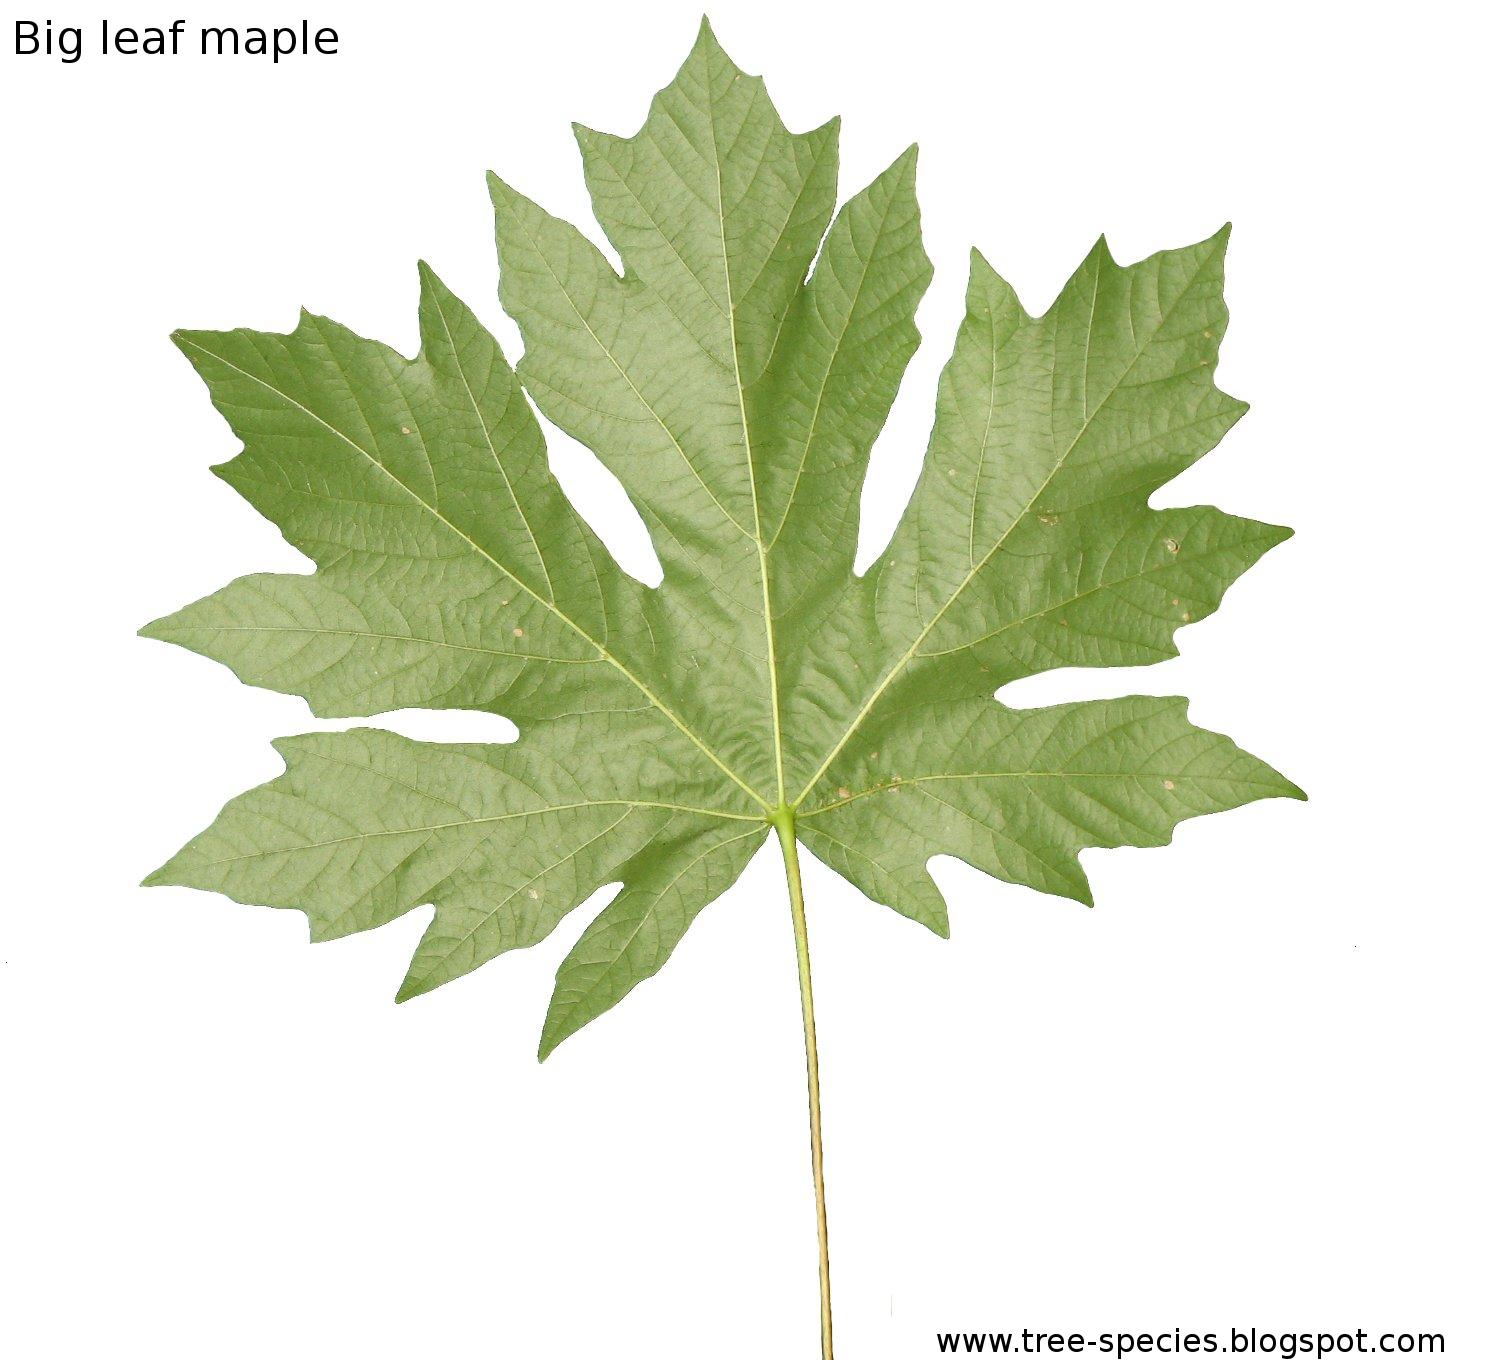 The World 180 S Tree Species 2012 05